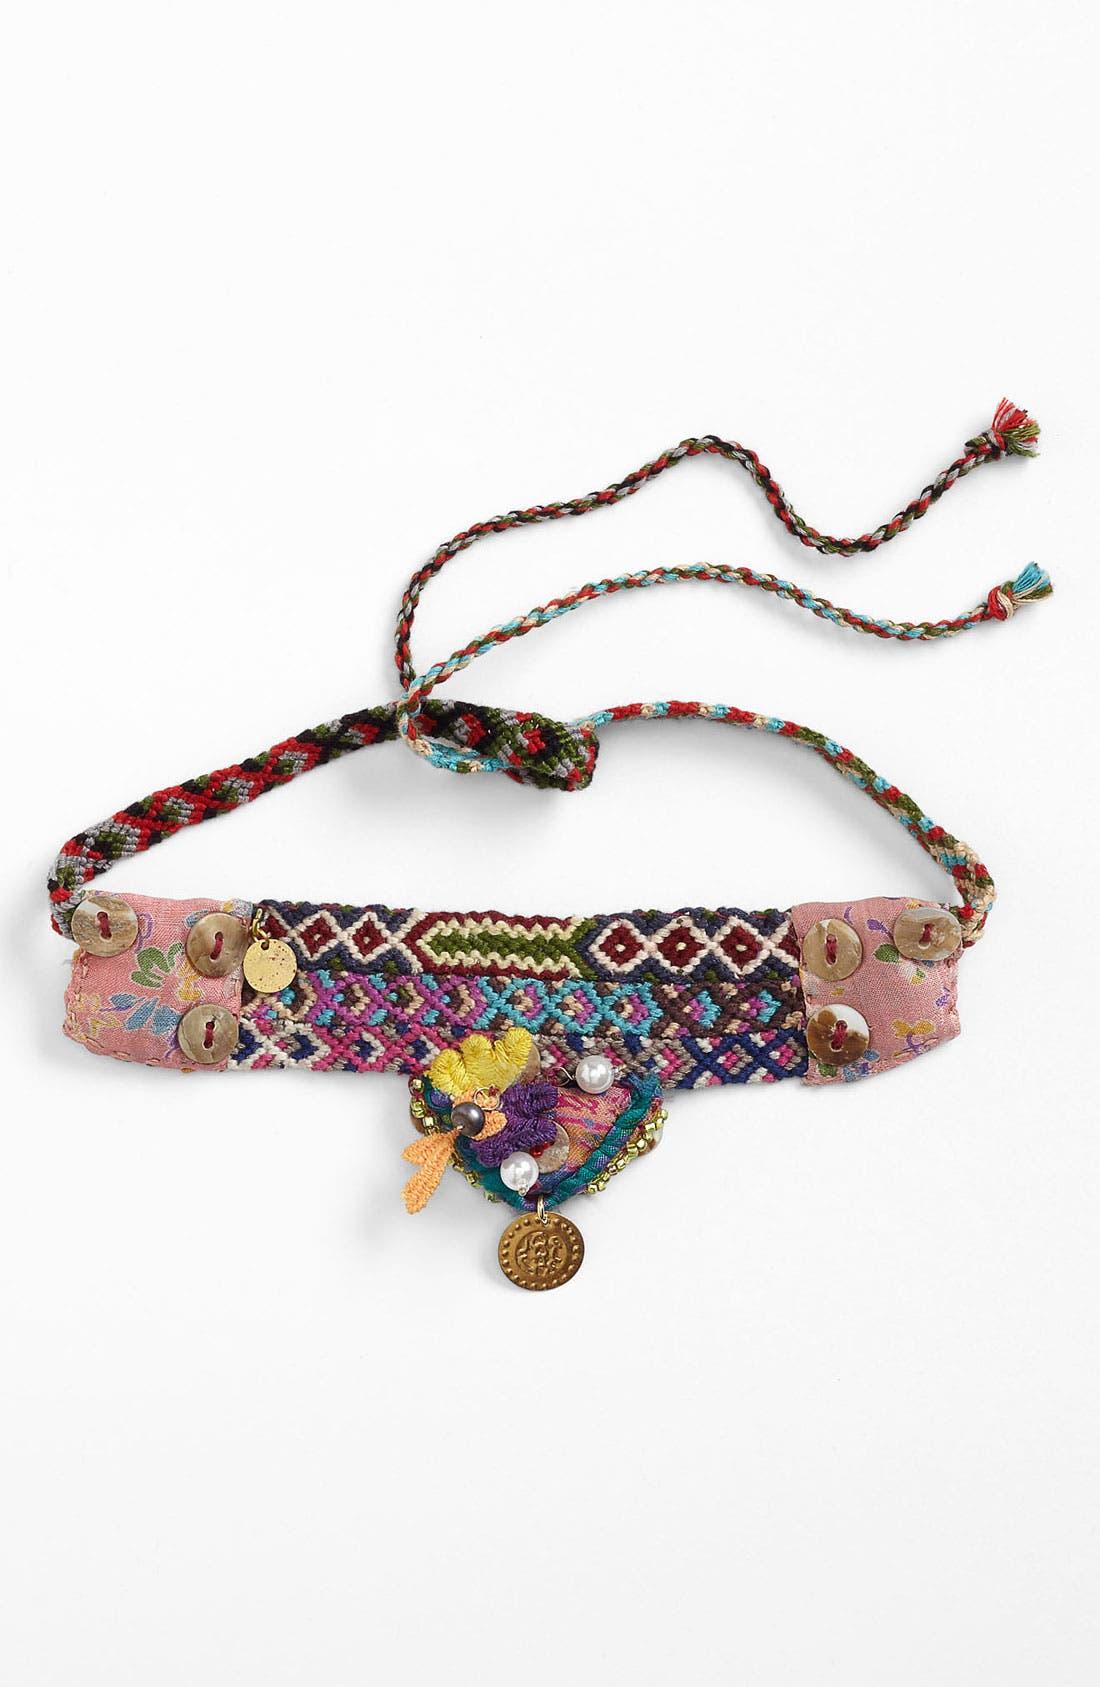 Alternate Image 1 Selected - Chan Luu Friendship Bracelet